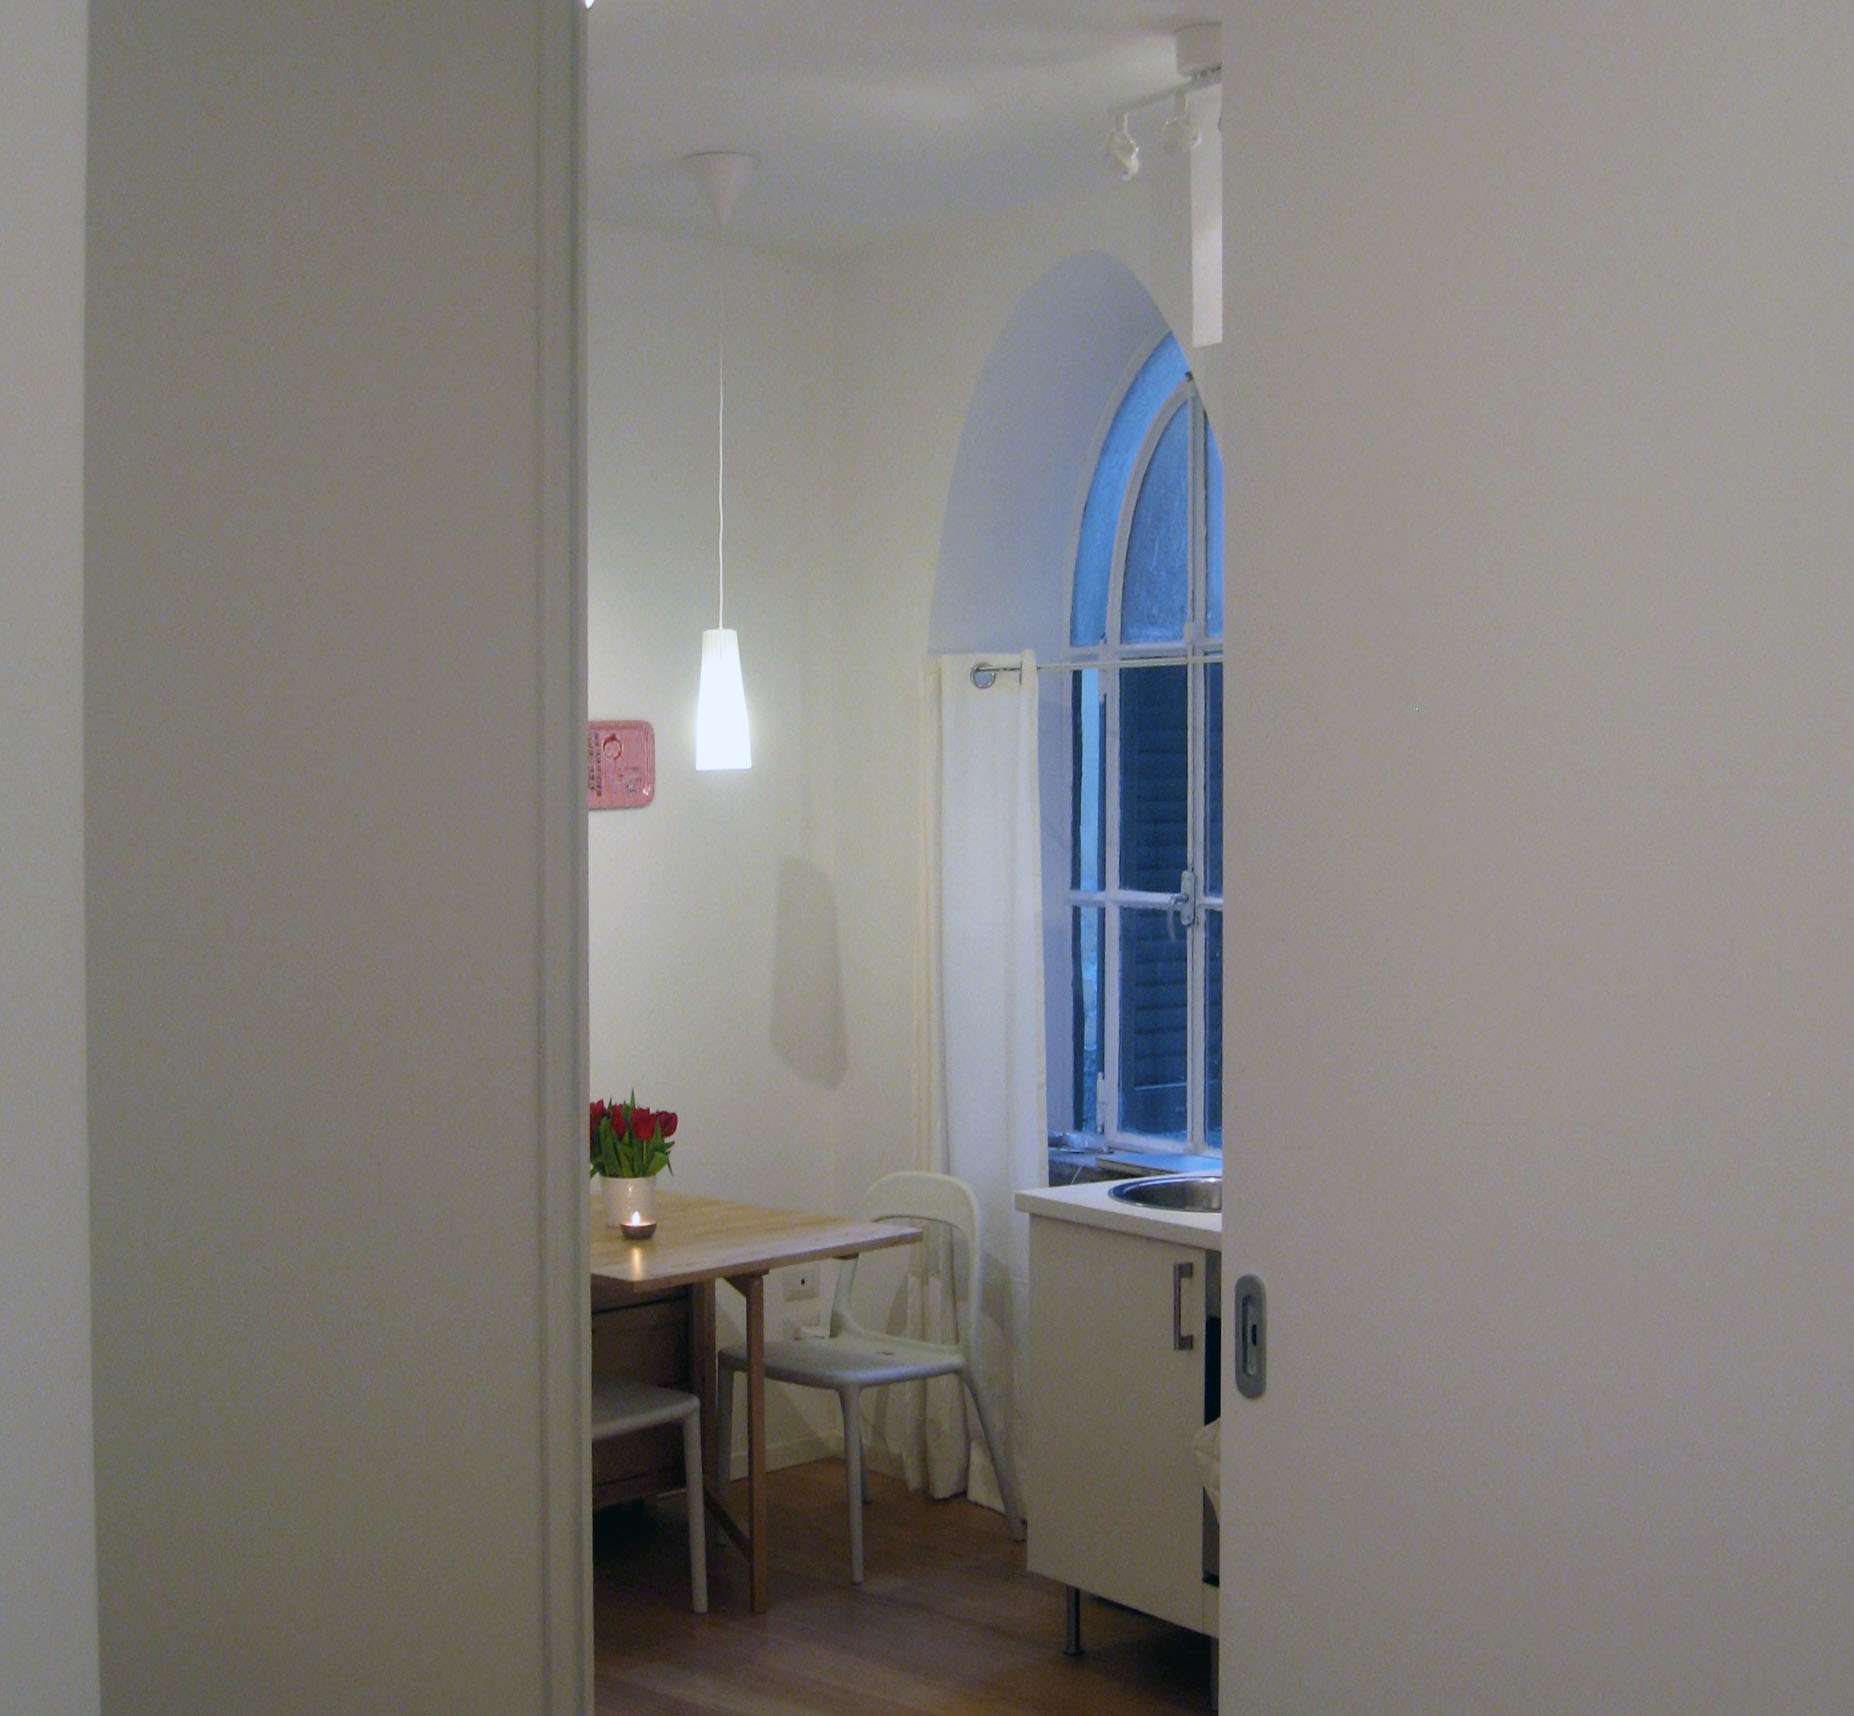 A Space Between - Milan, 2009